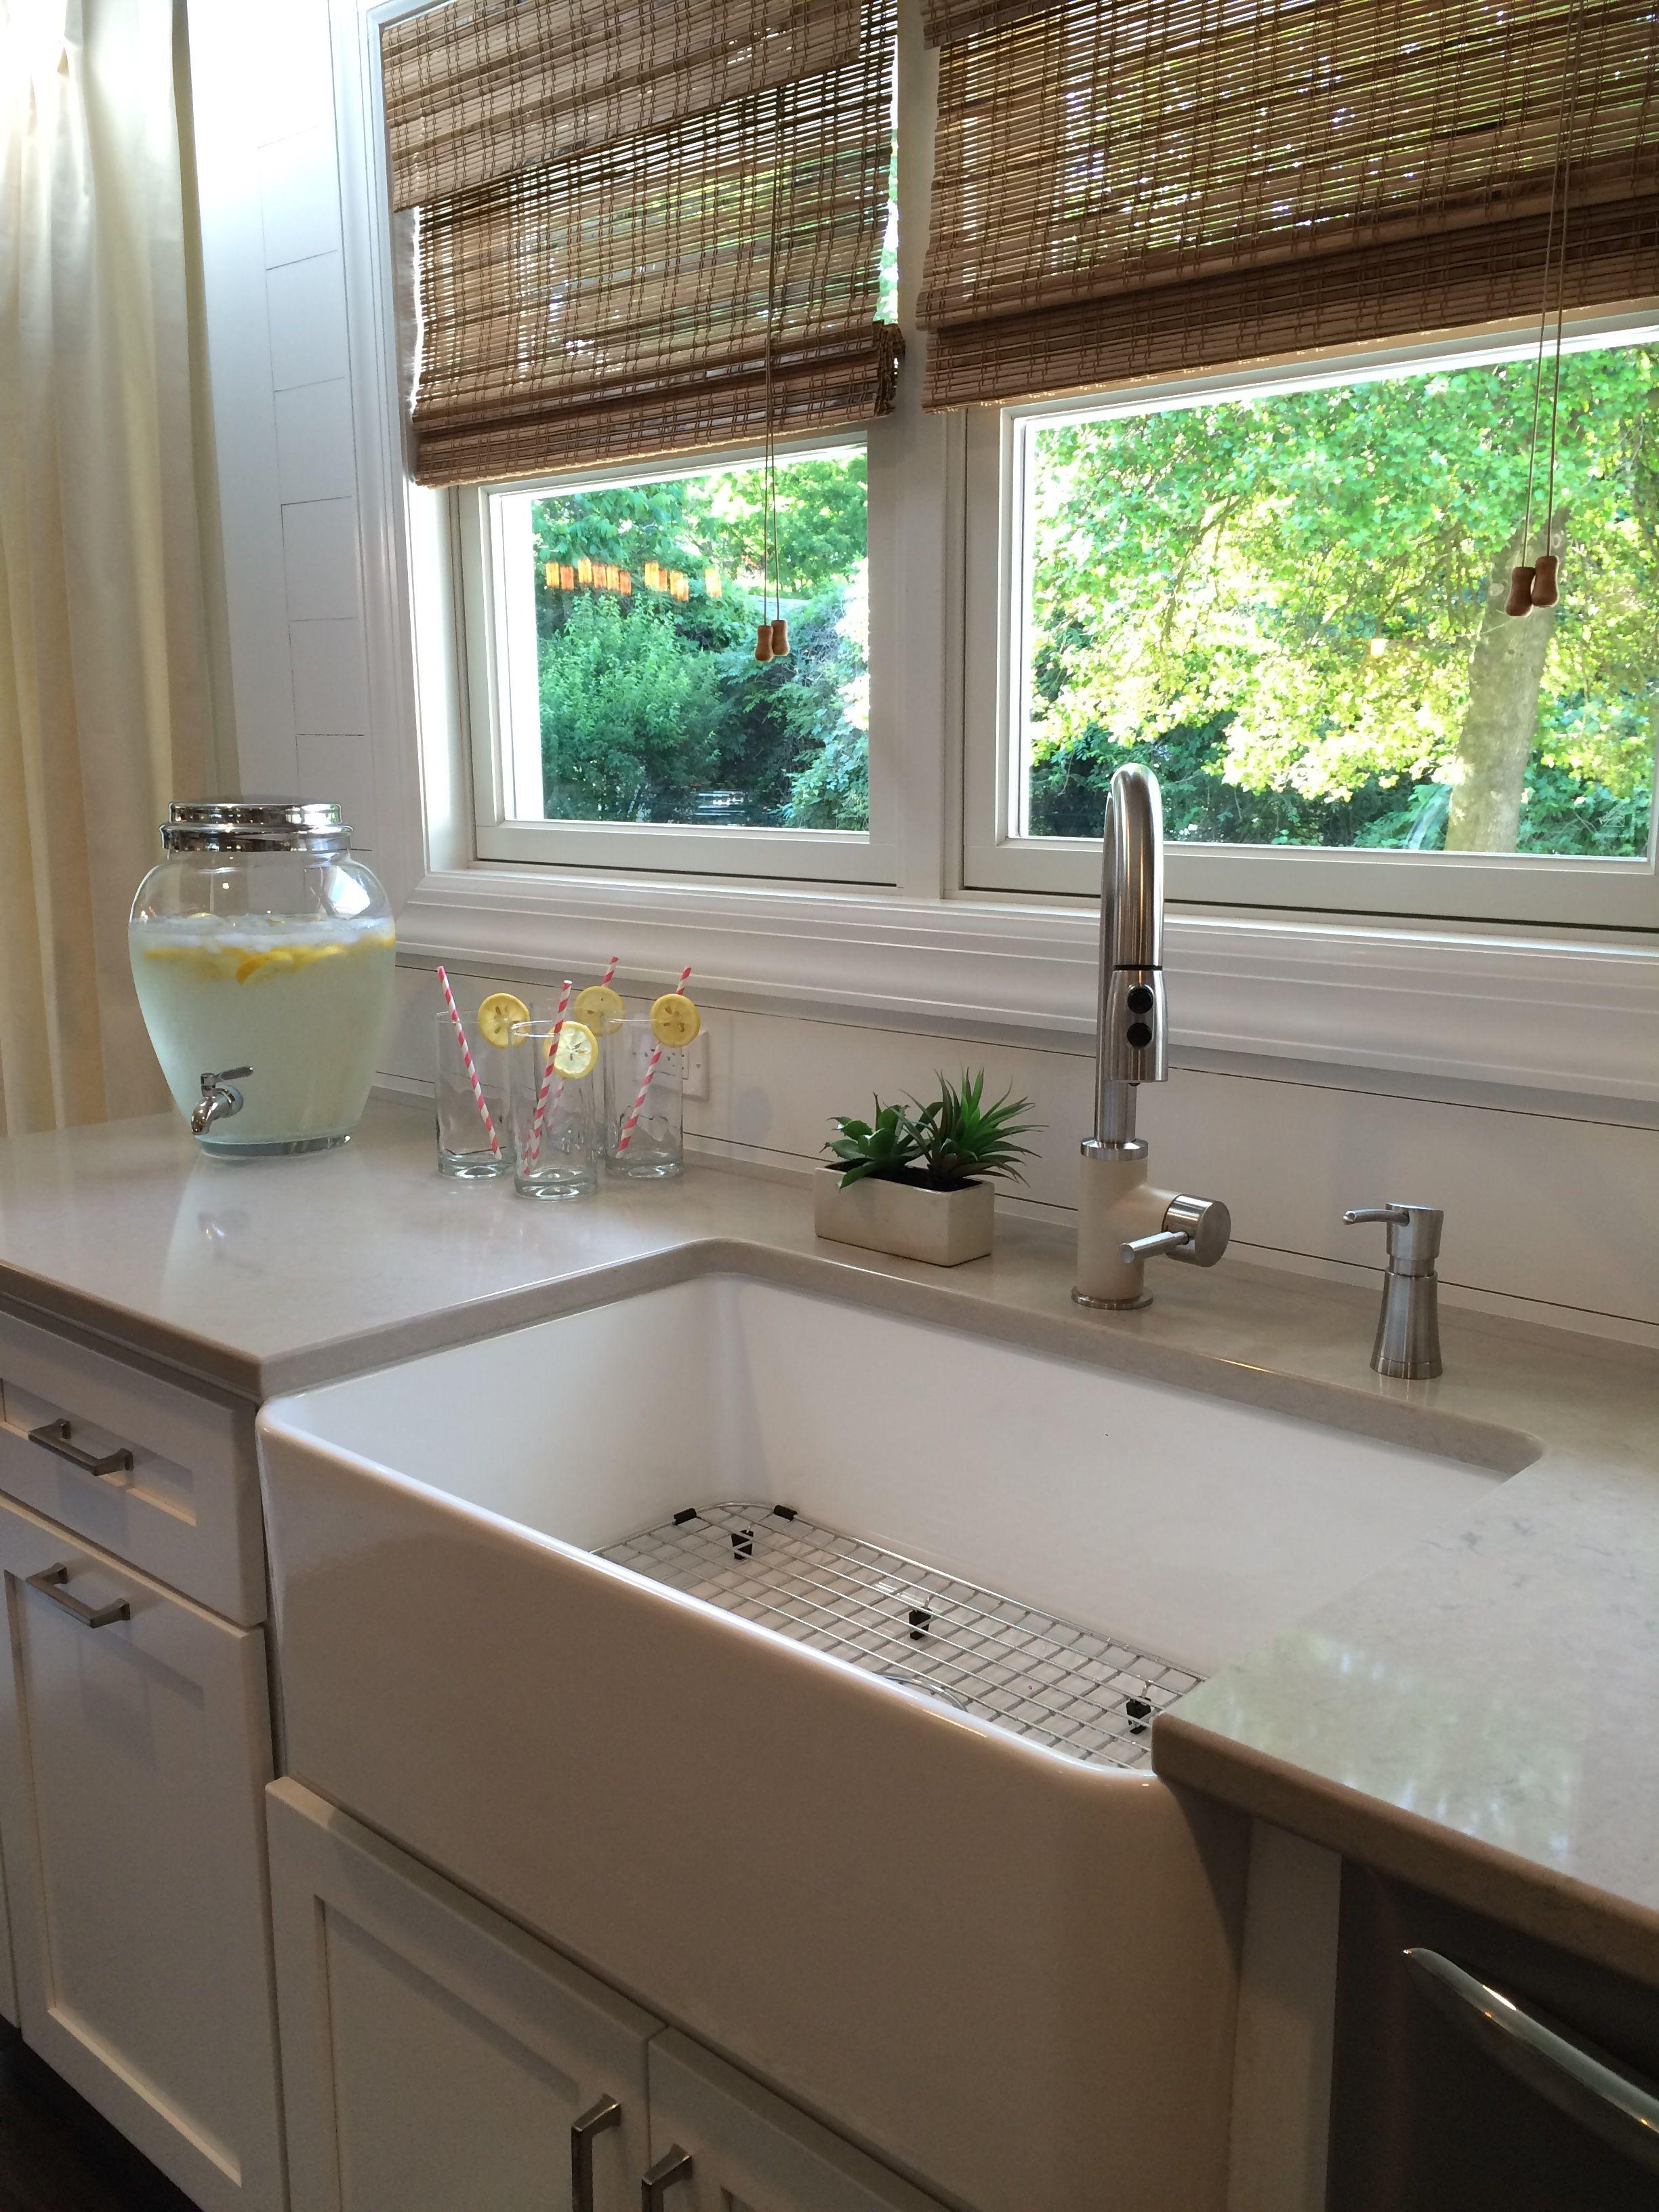 Blanco, Farmhouse Sink U0026 Faucet